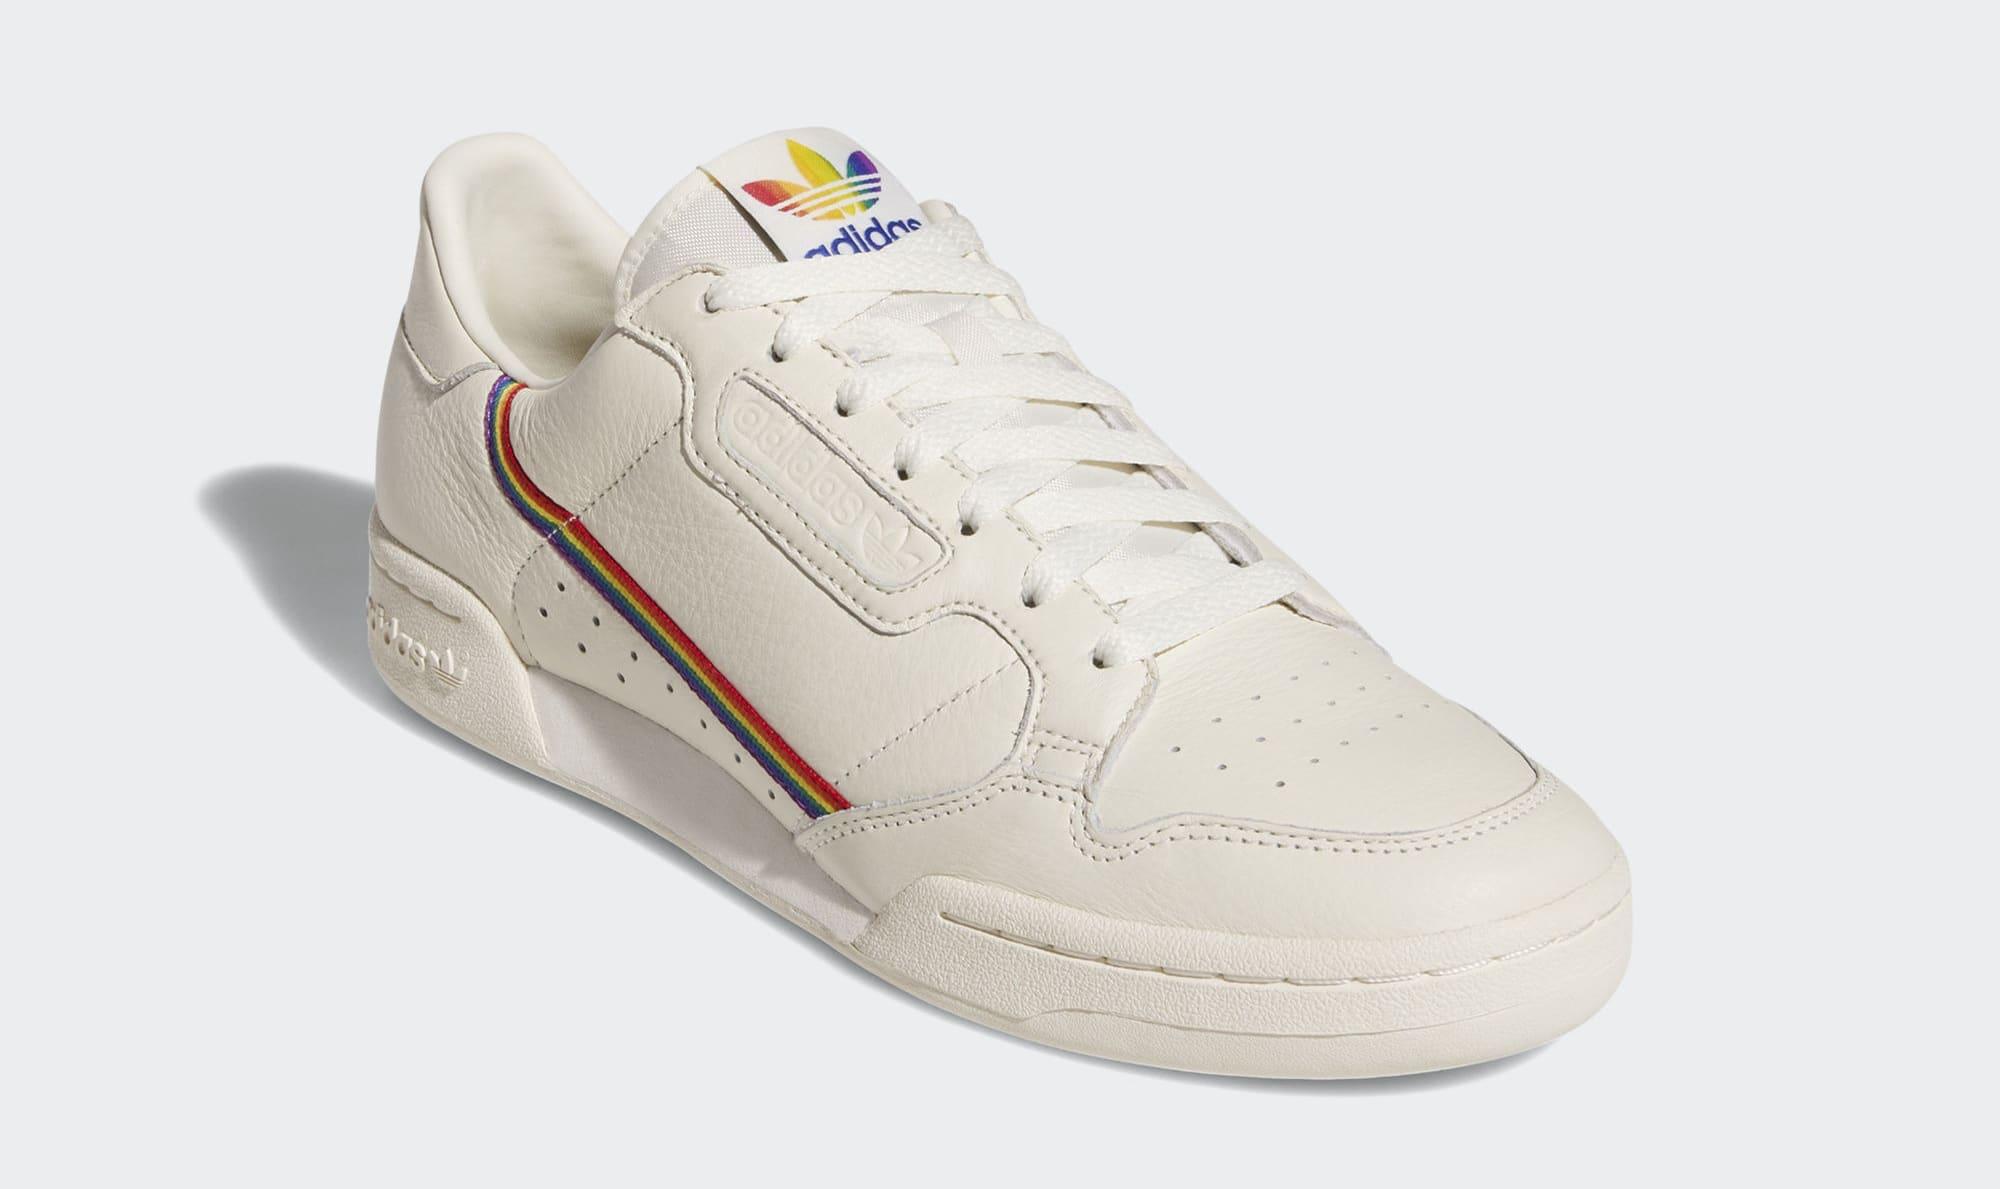 Adidas Continental 80 'Pride' EF2318 (Angle)